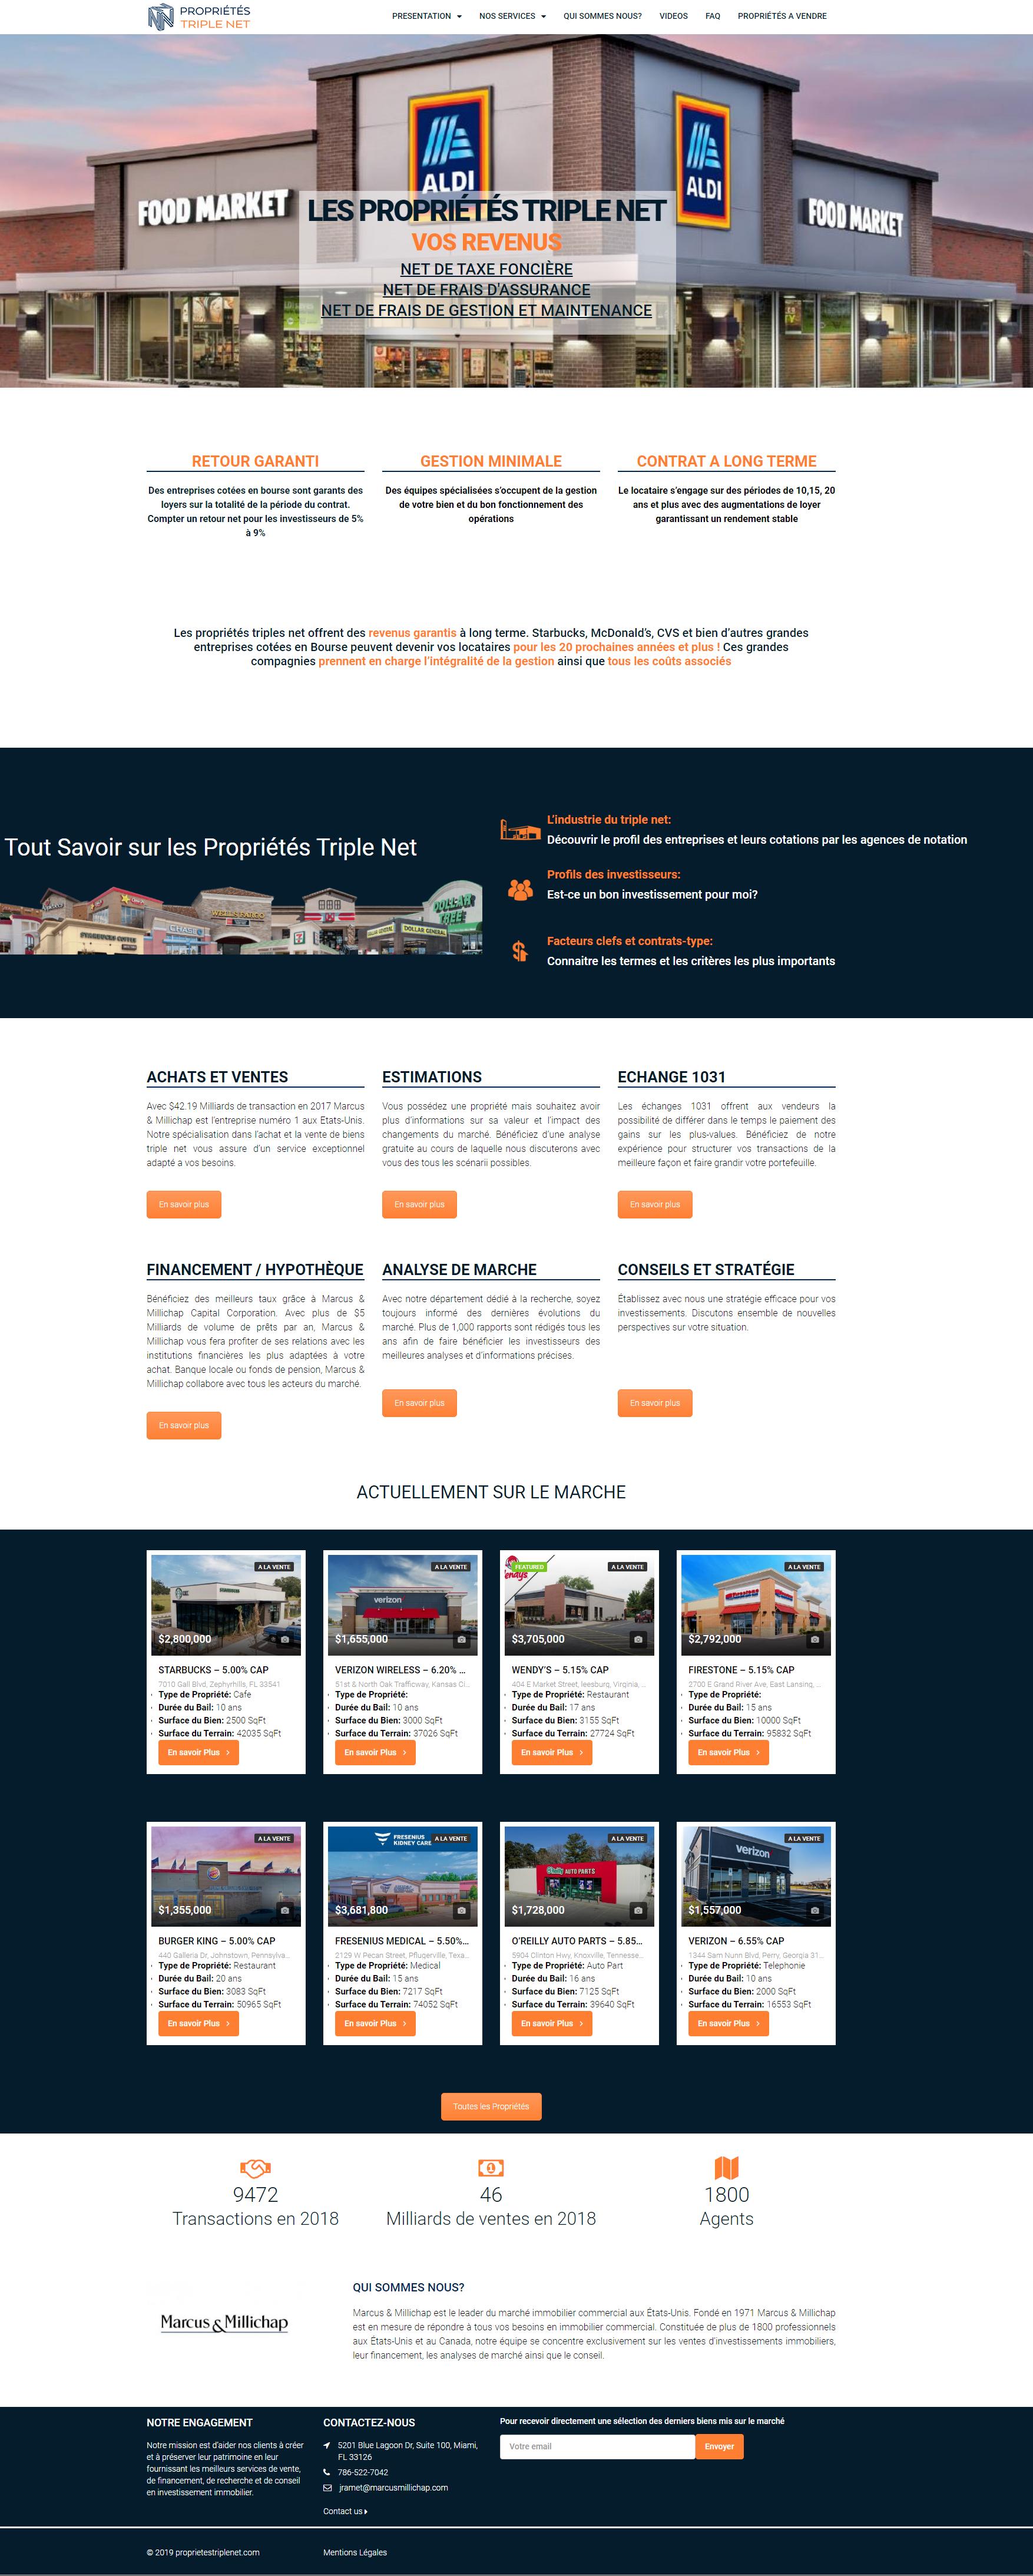 proprietes-triple-net.com